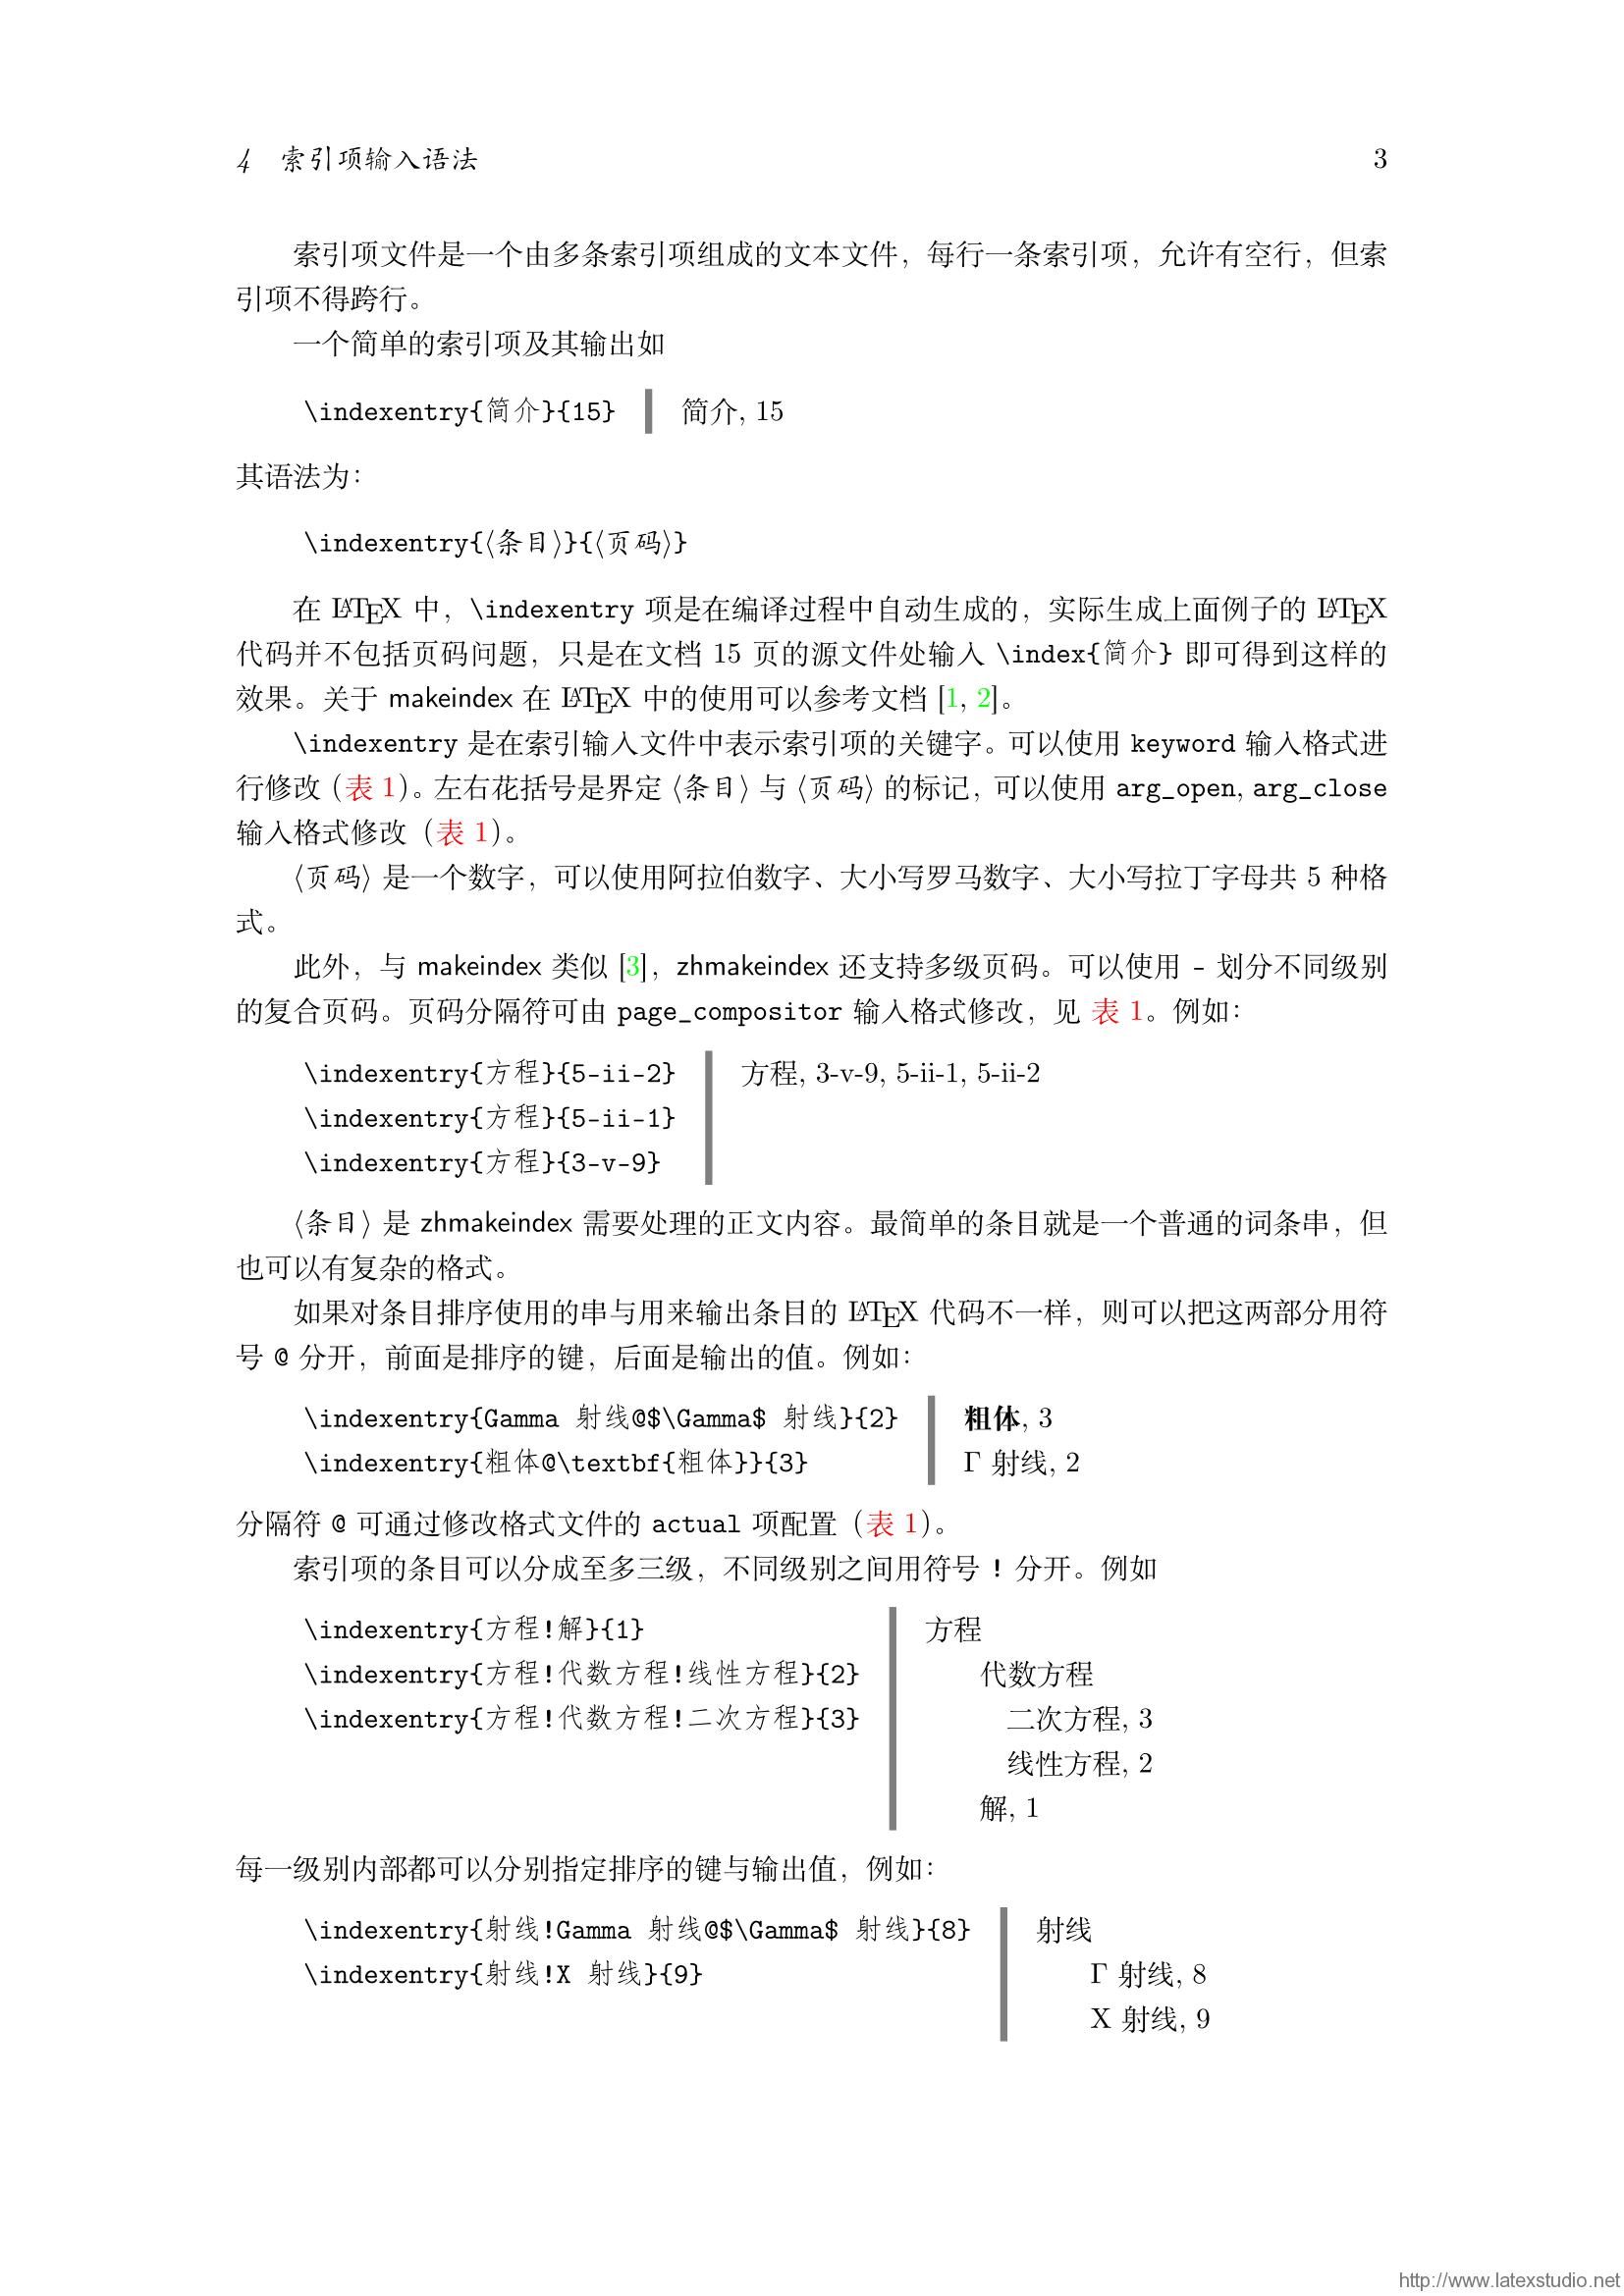 zhmakeindex-03